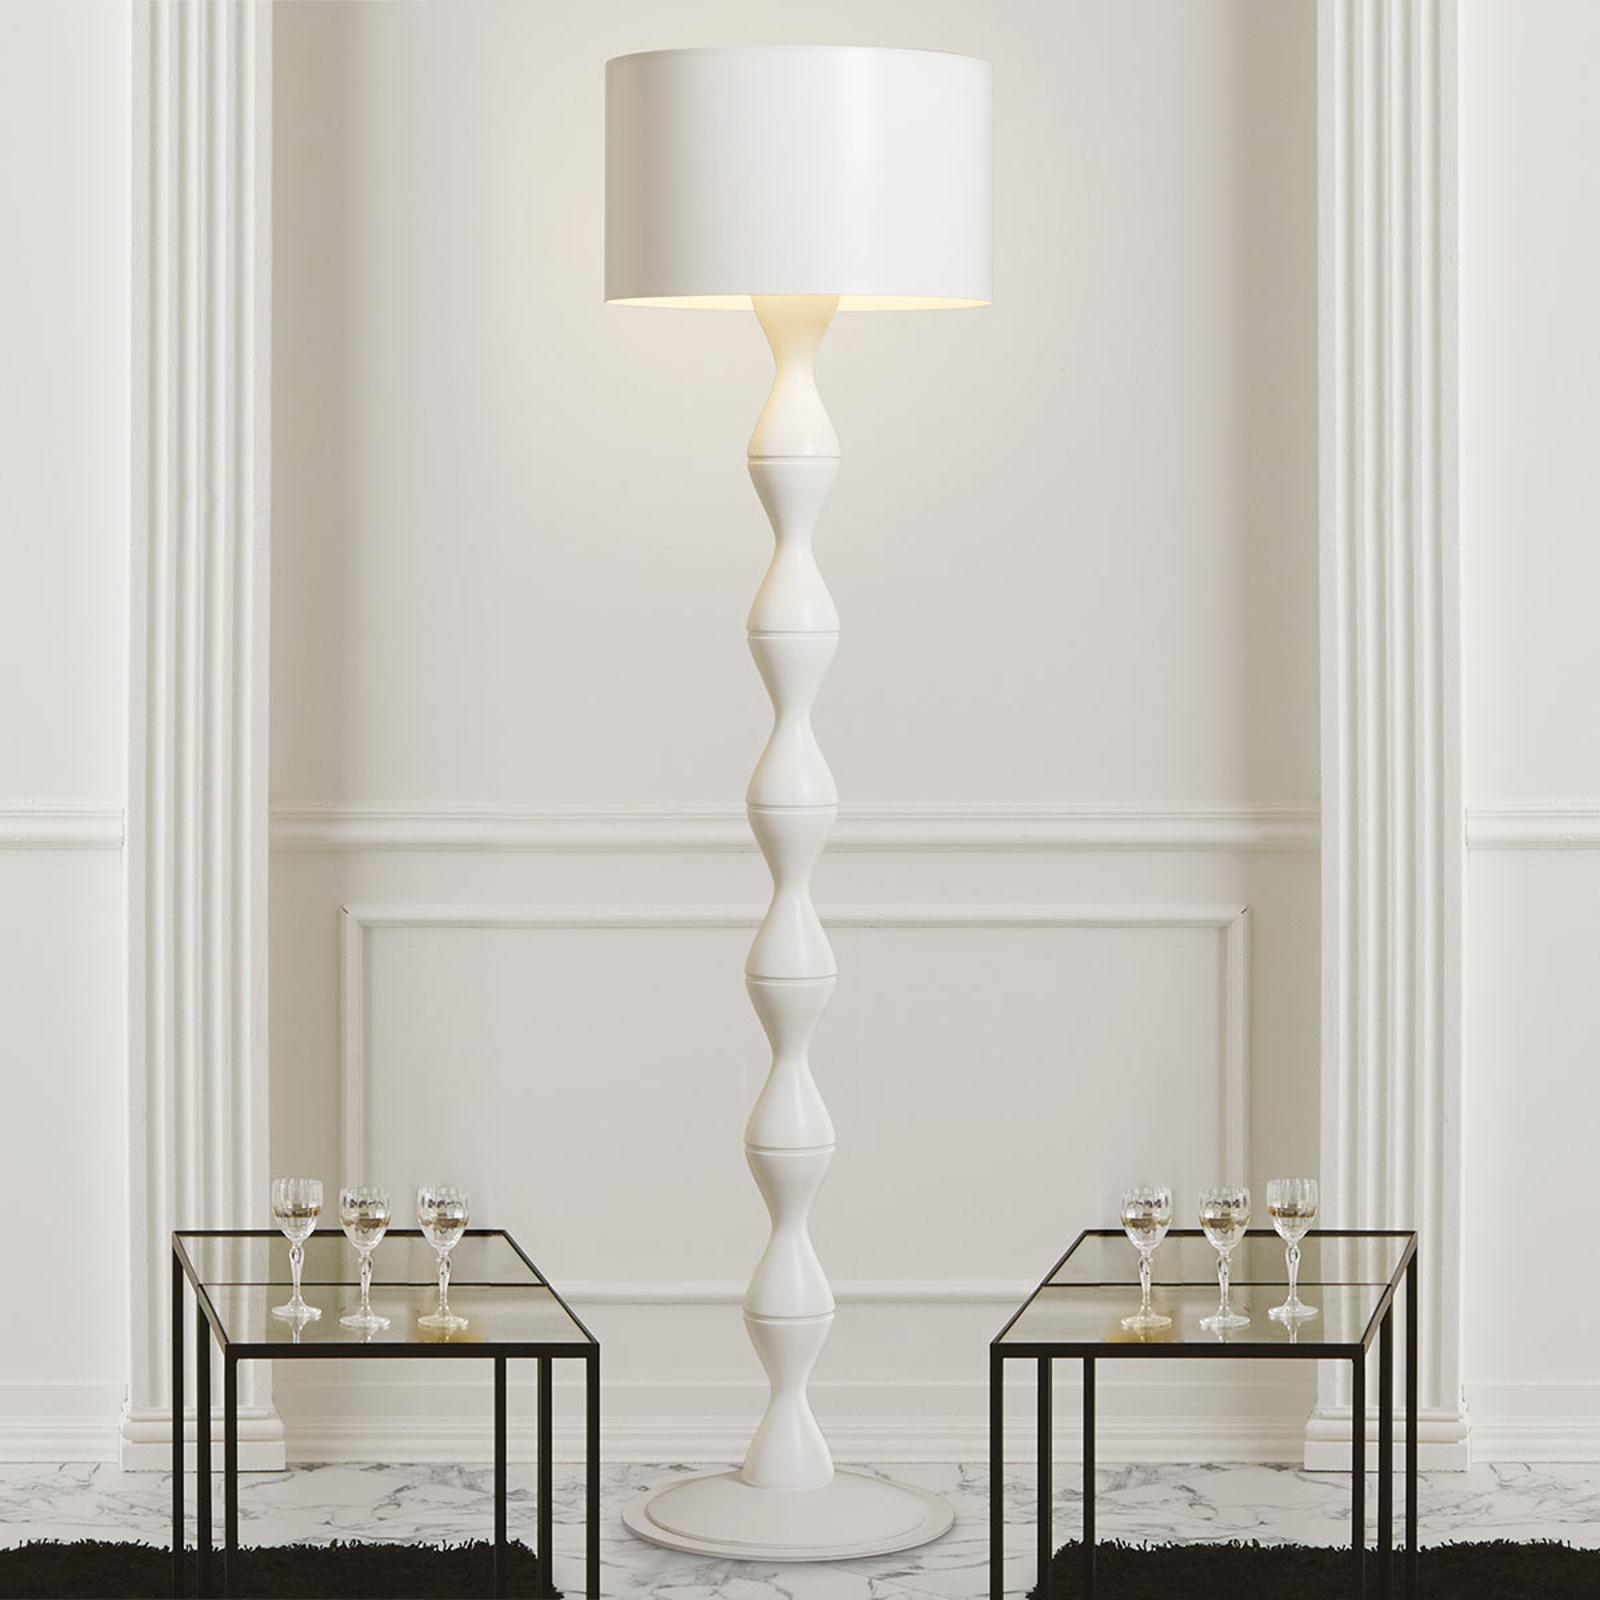 Biała designerska lampa stojąca Sara